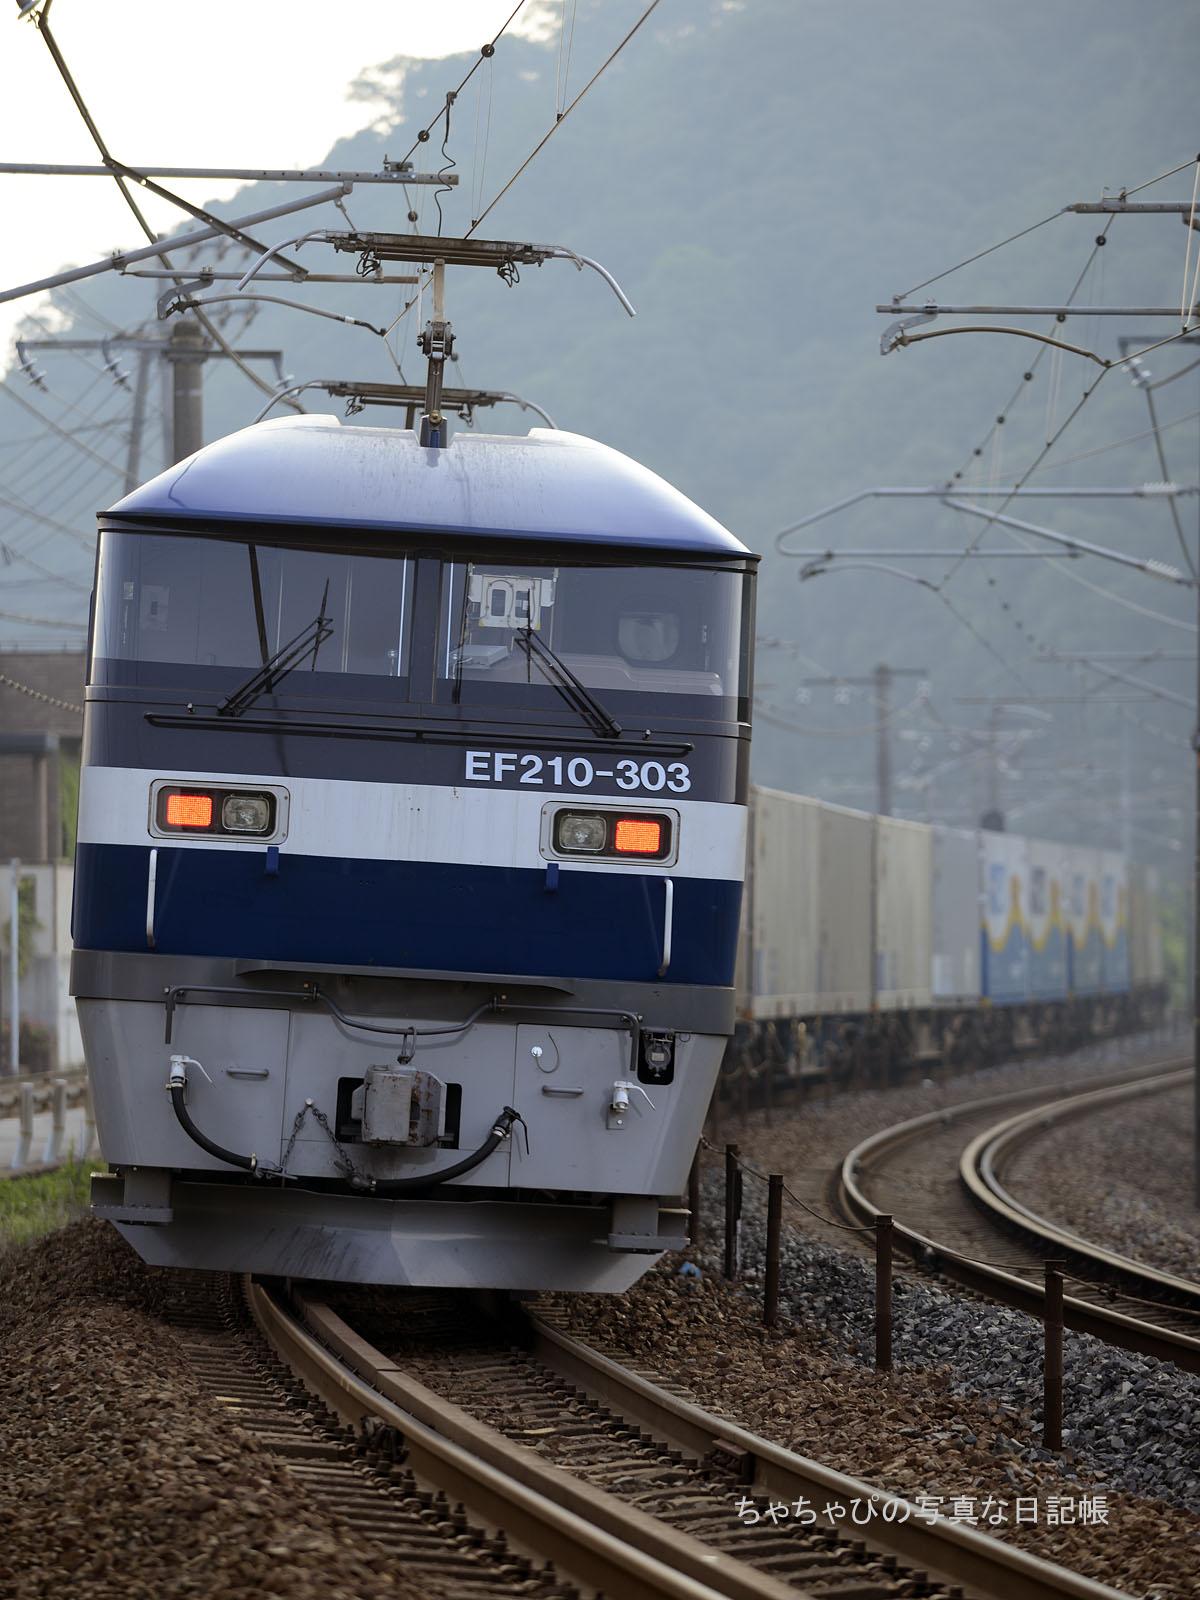 1050レ、EF210-303 中野東駅~瀬野駅